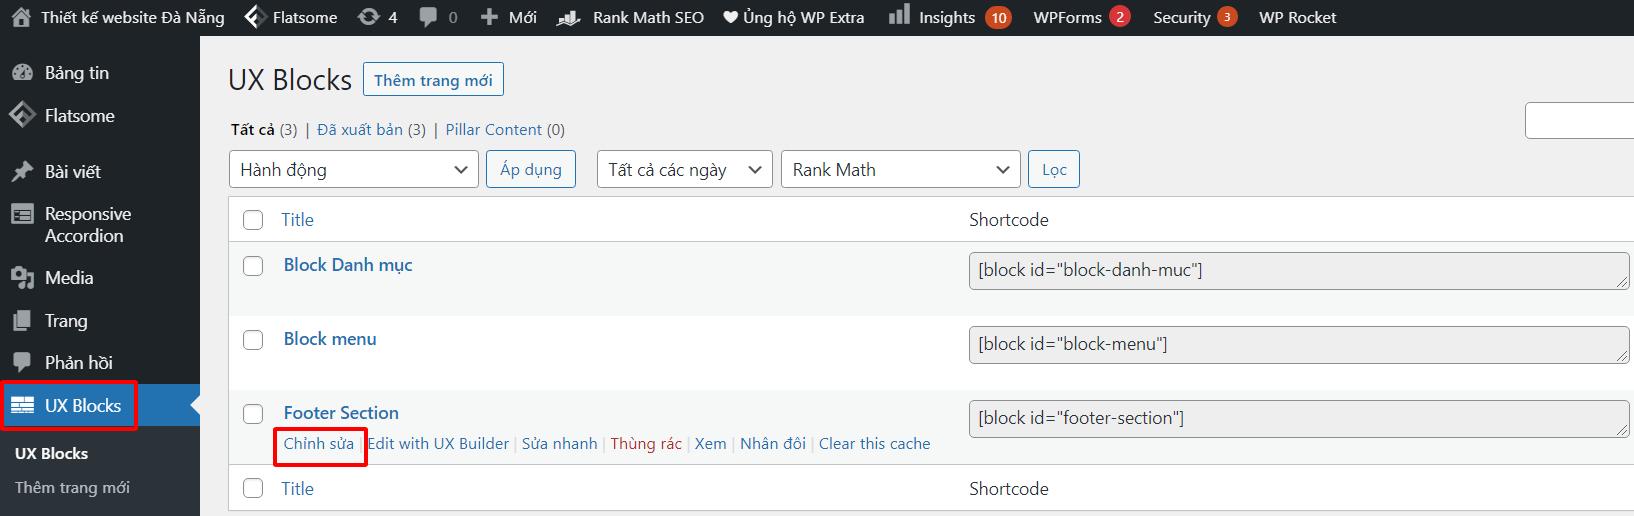 Chỉnh sửa footer wordpress bằng UX BLOCKS